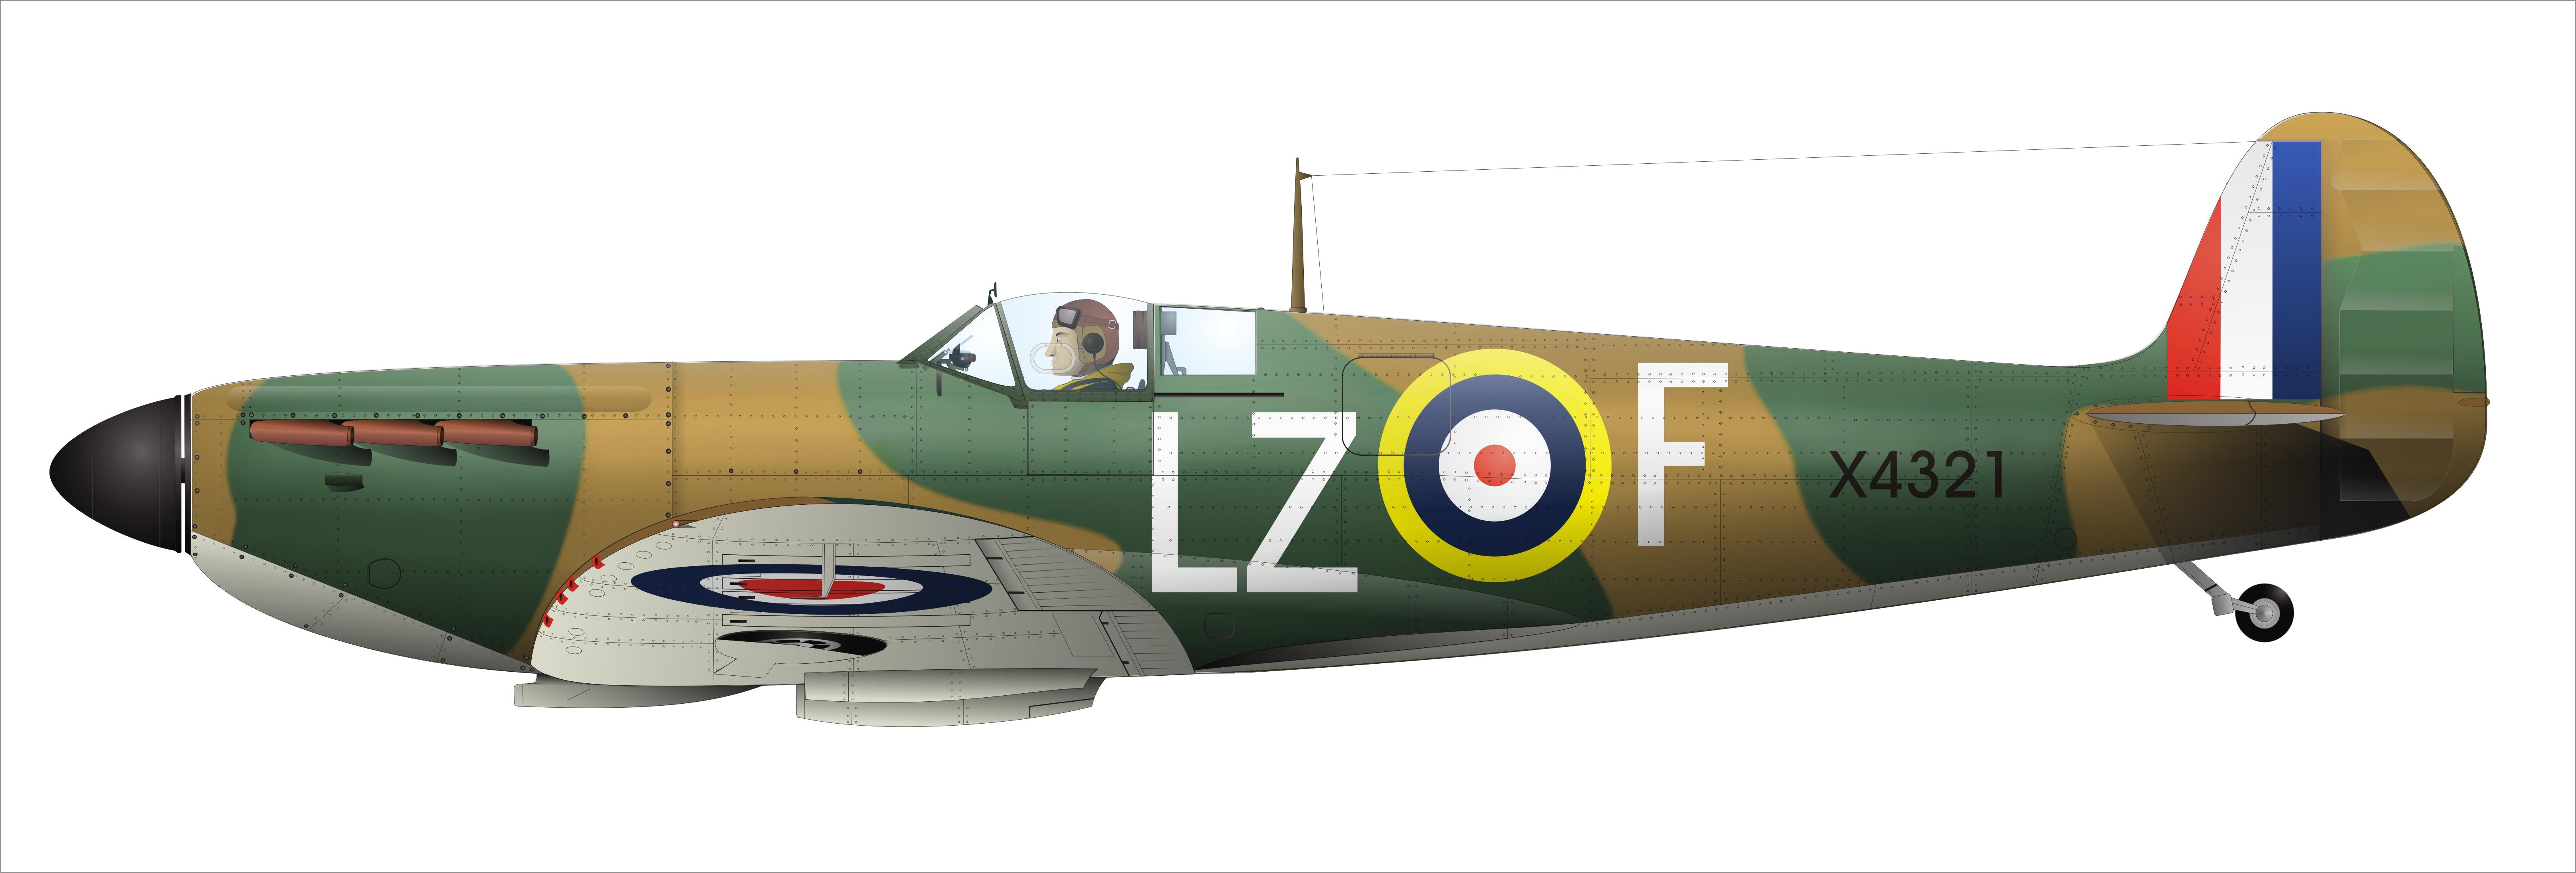 Artwork Wiki Spitfire MkIa RAF 66Sqn LZ F PO Crelin Bodie X4321 Kenley 1940 0A